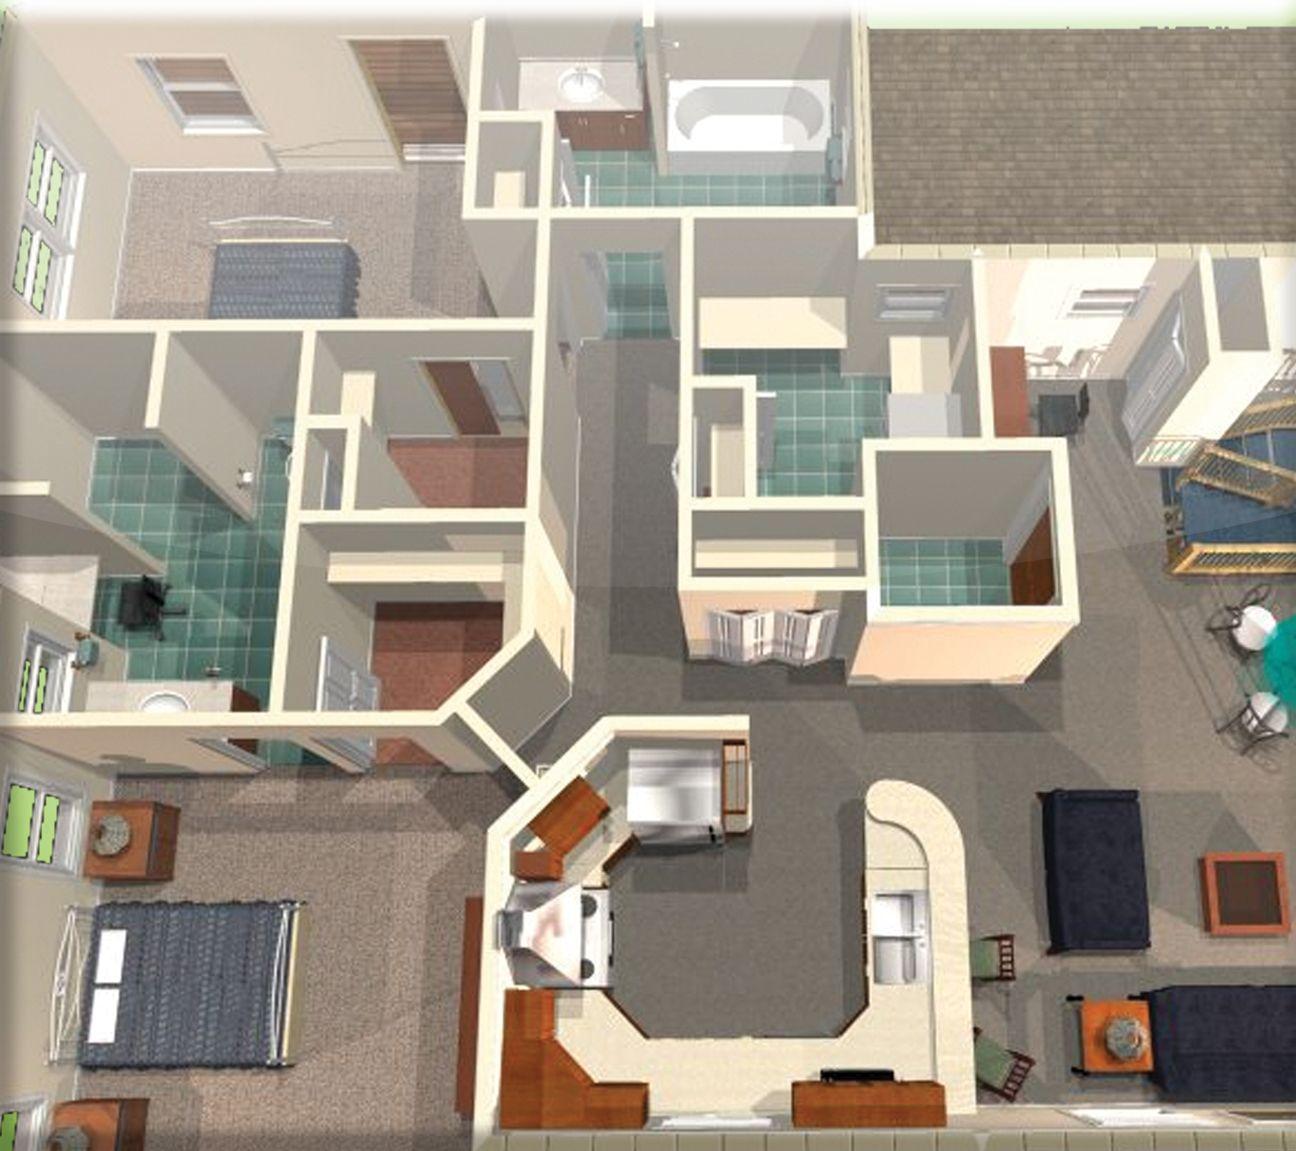 Home interior design software free trial also conception de la maison rh pinterest